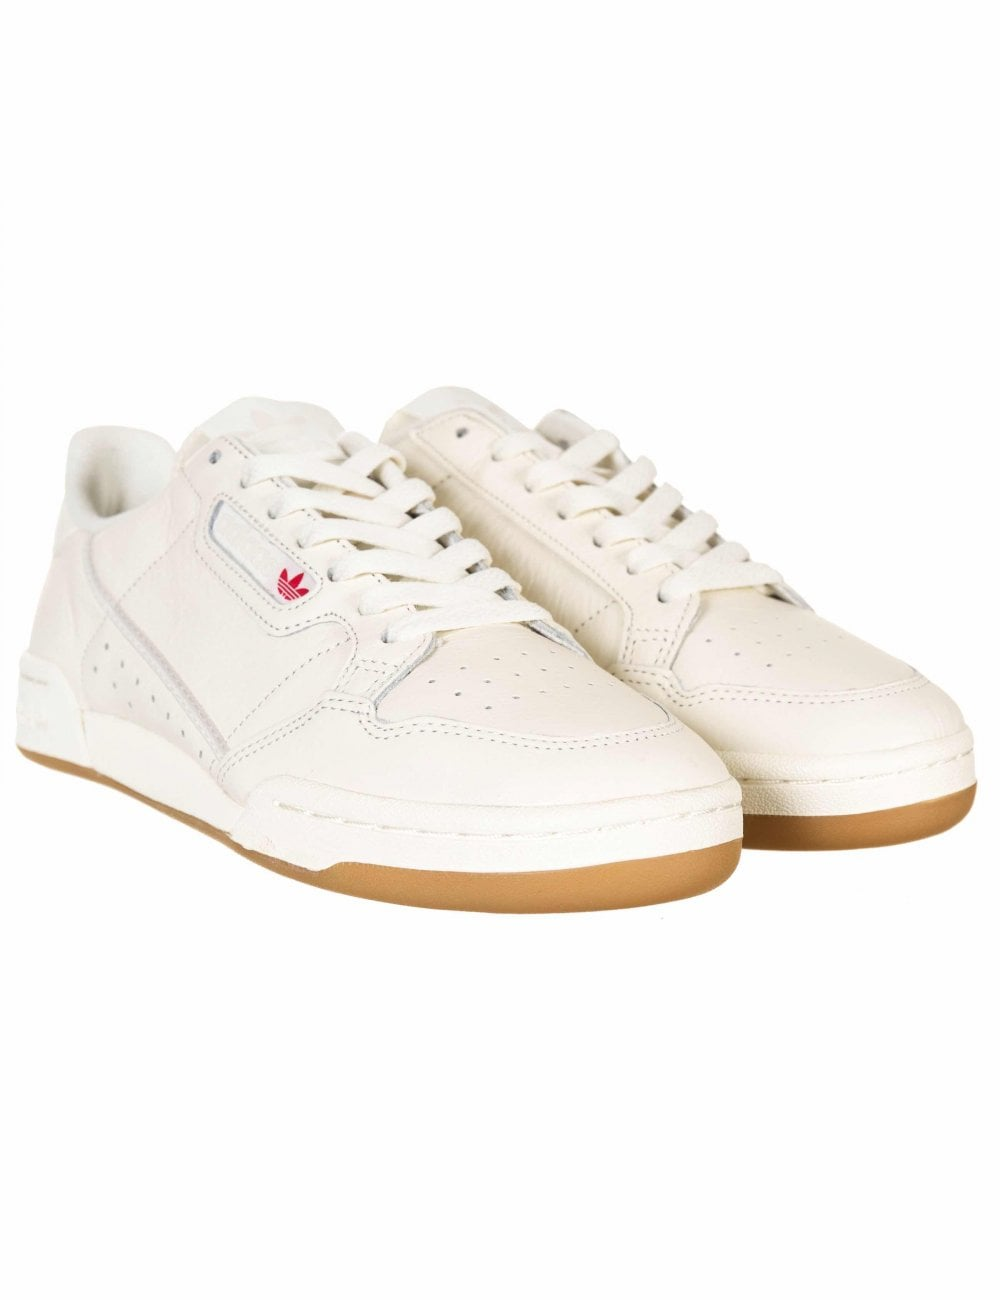 Off White//Raw Gum Adidas Originals Continental 80 Trainers